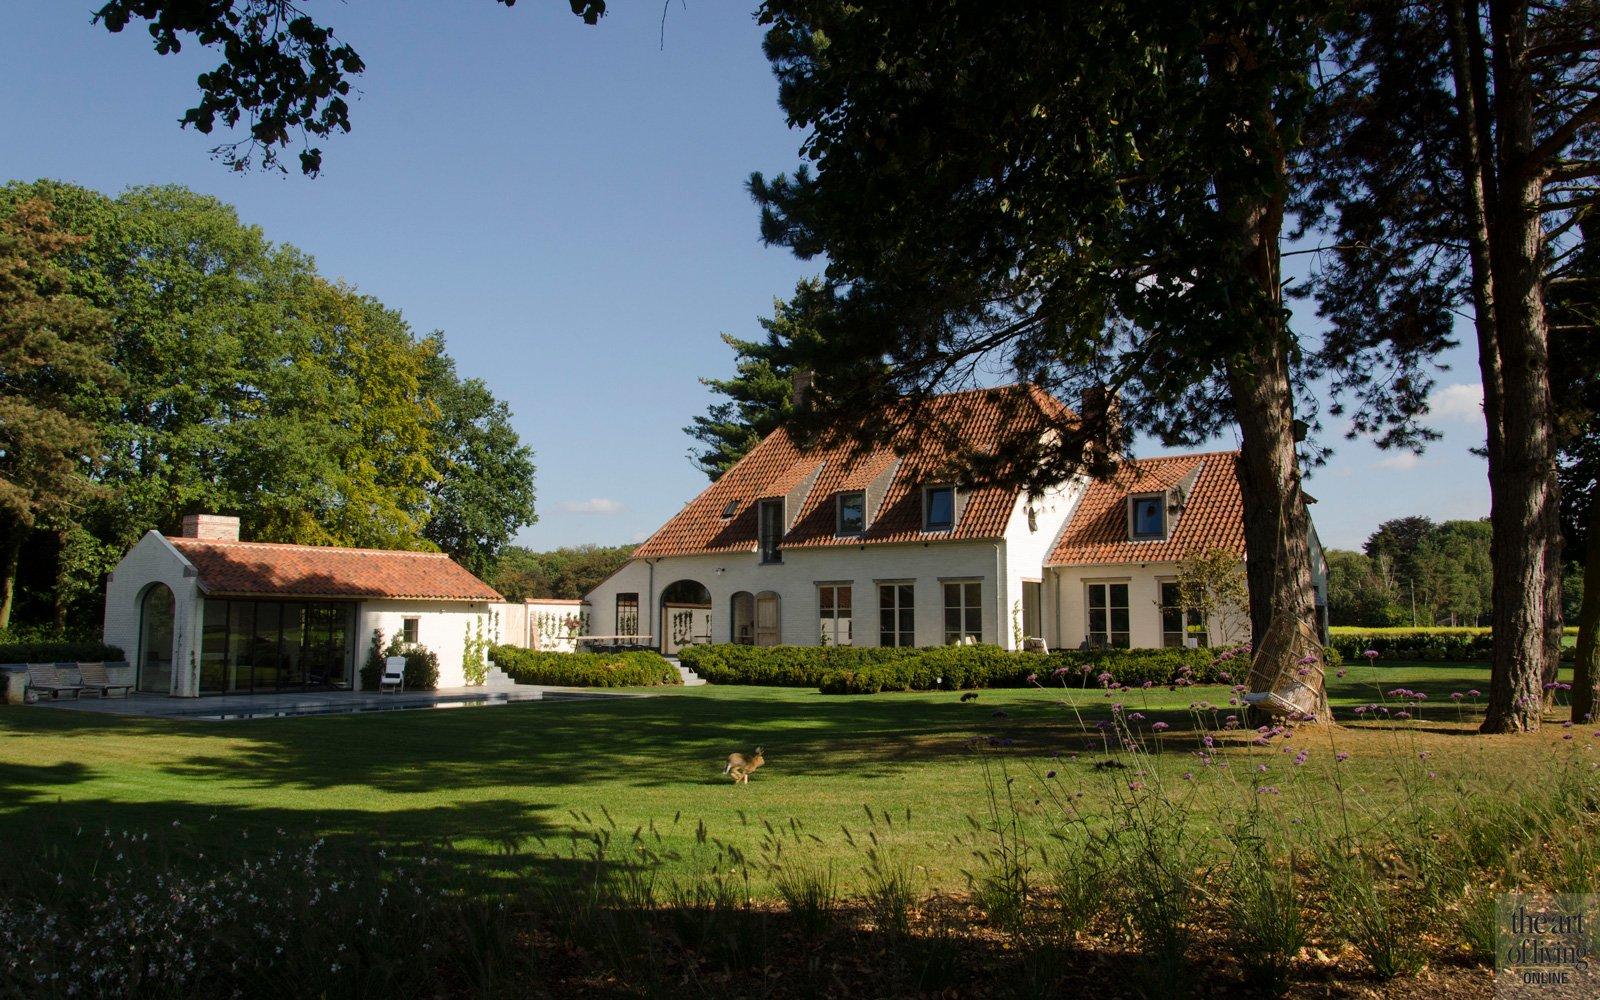 Architectenbureau Bart Moors, woning, prachtige omgeving, discrete tuin, Frederiek Snaet